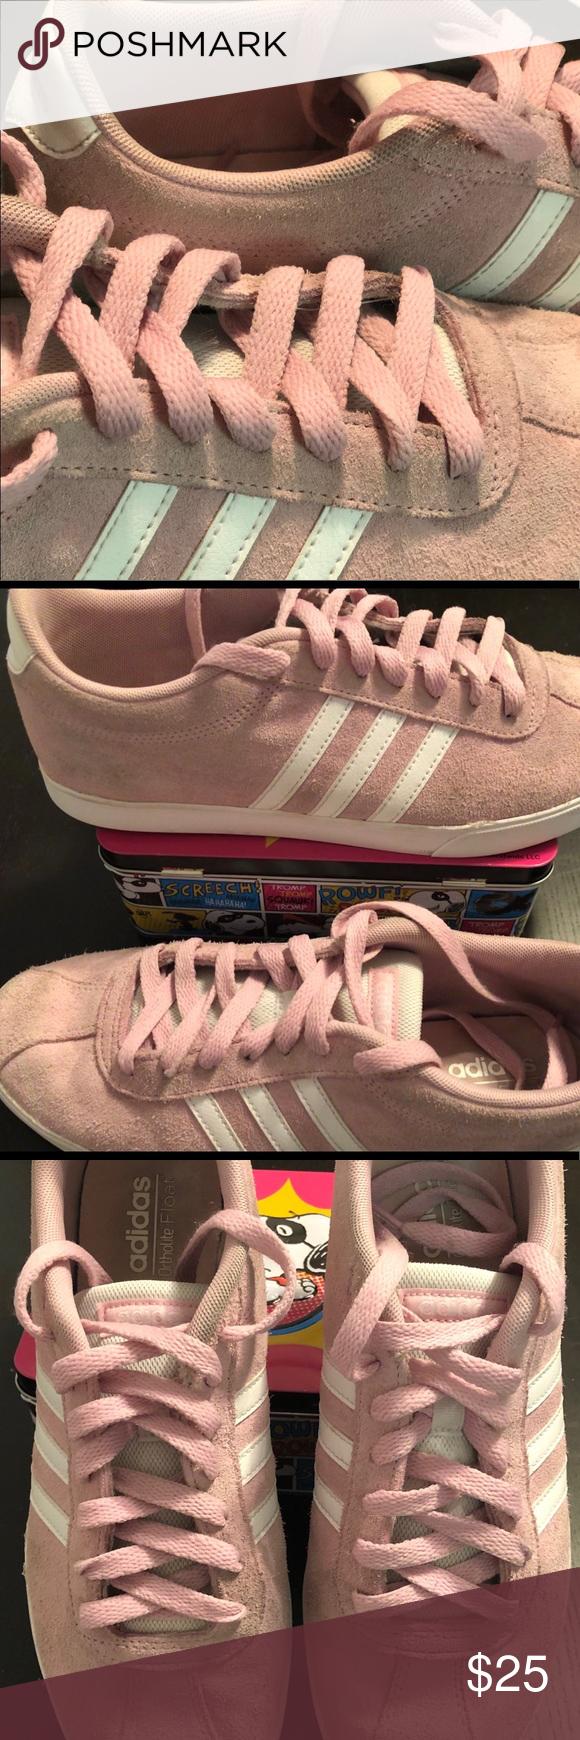 Adidas Courtset Ortholite Float in Pink